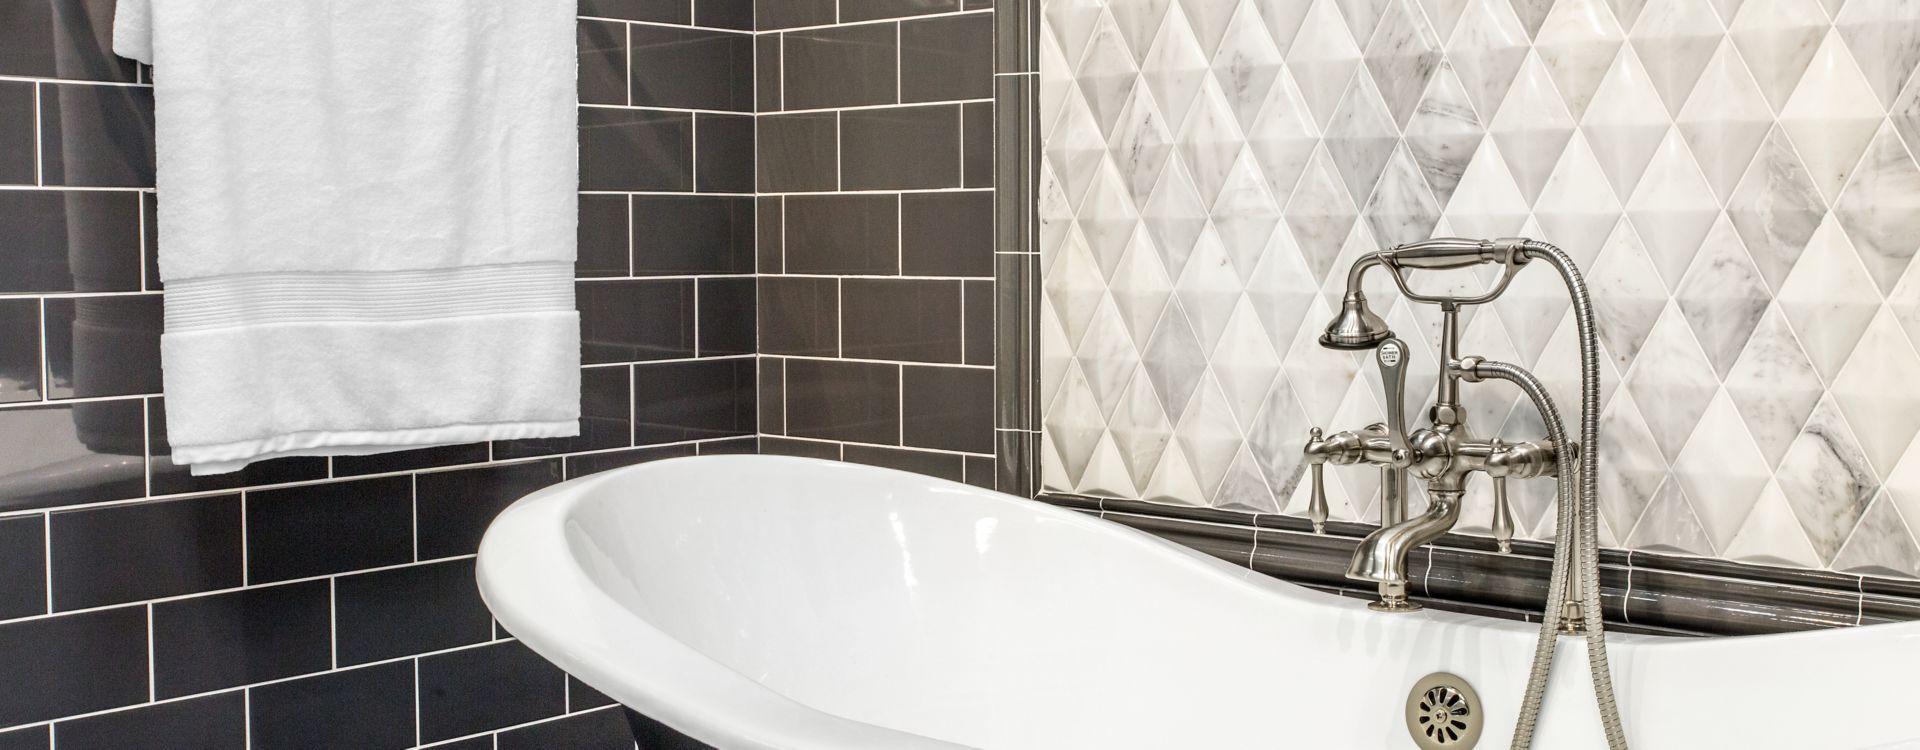 Modern bathtub – Reasons to remodel your bathroom - Fort Myers - Richardson Custom Homes